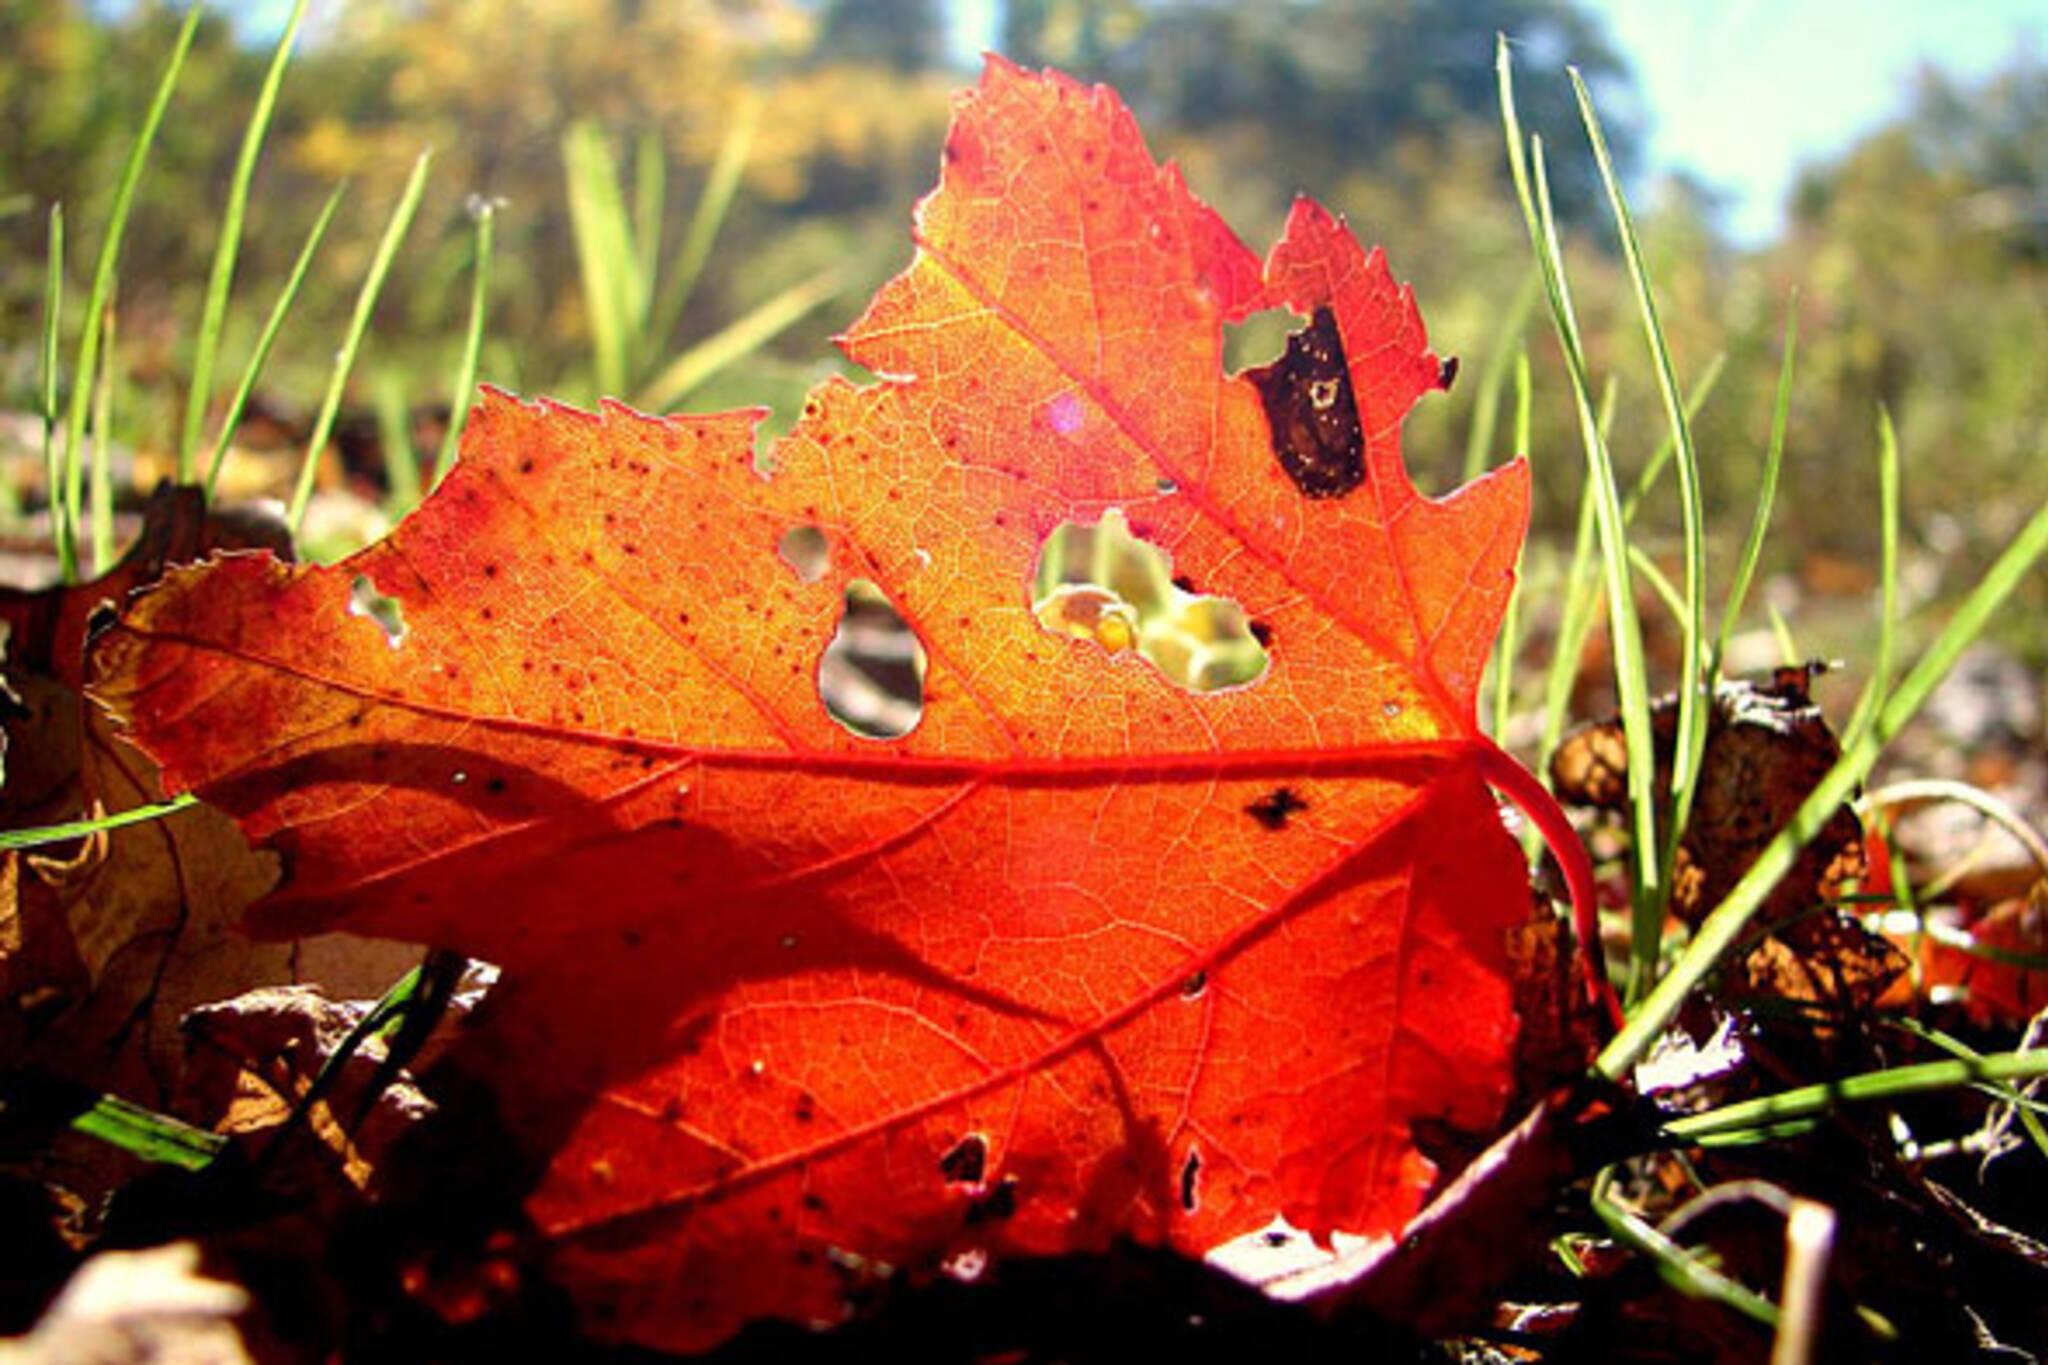 blogTO Mornign Brew fallen leaves